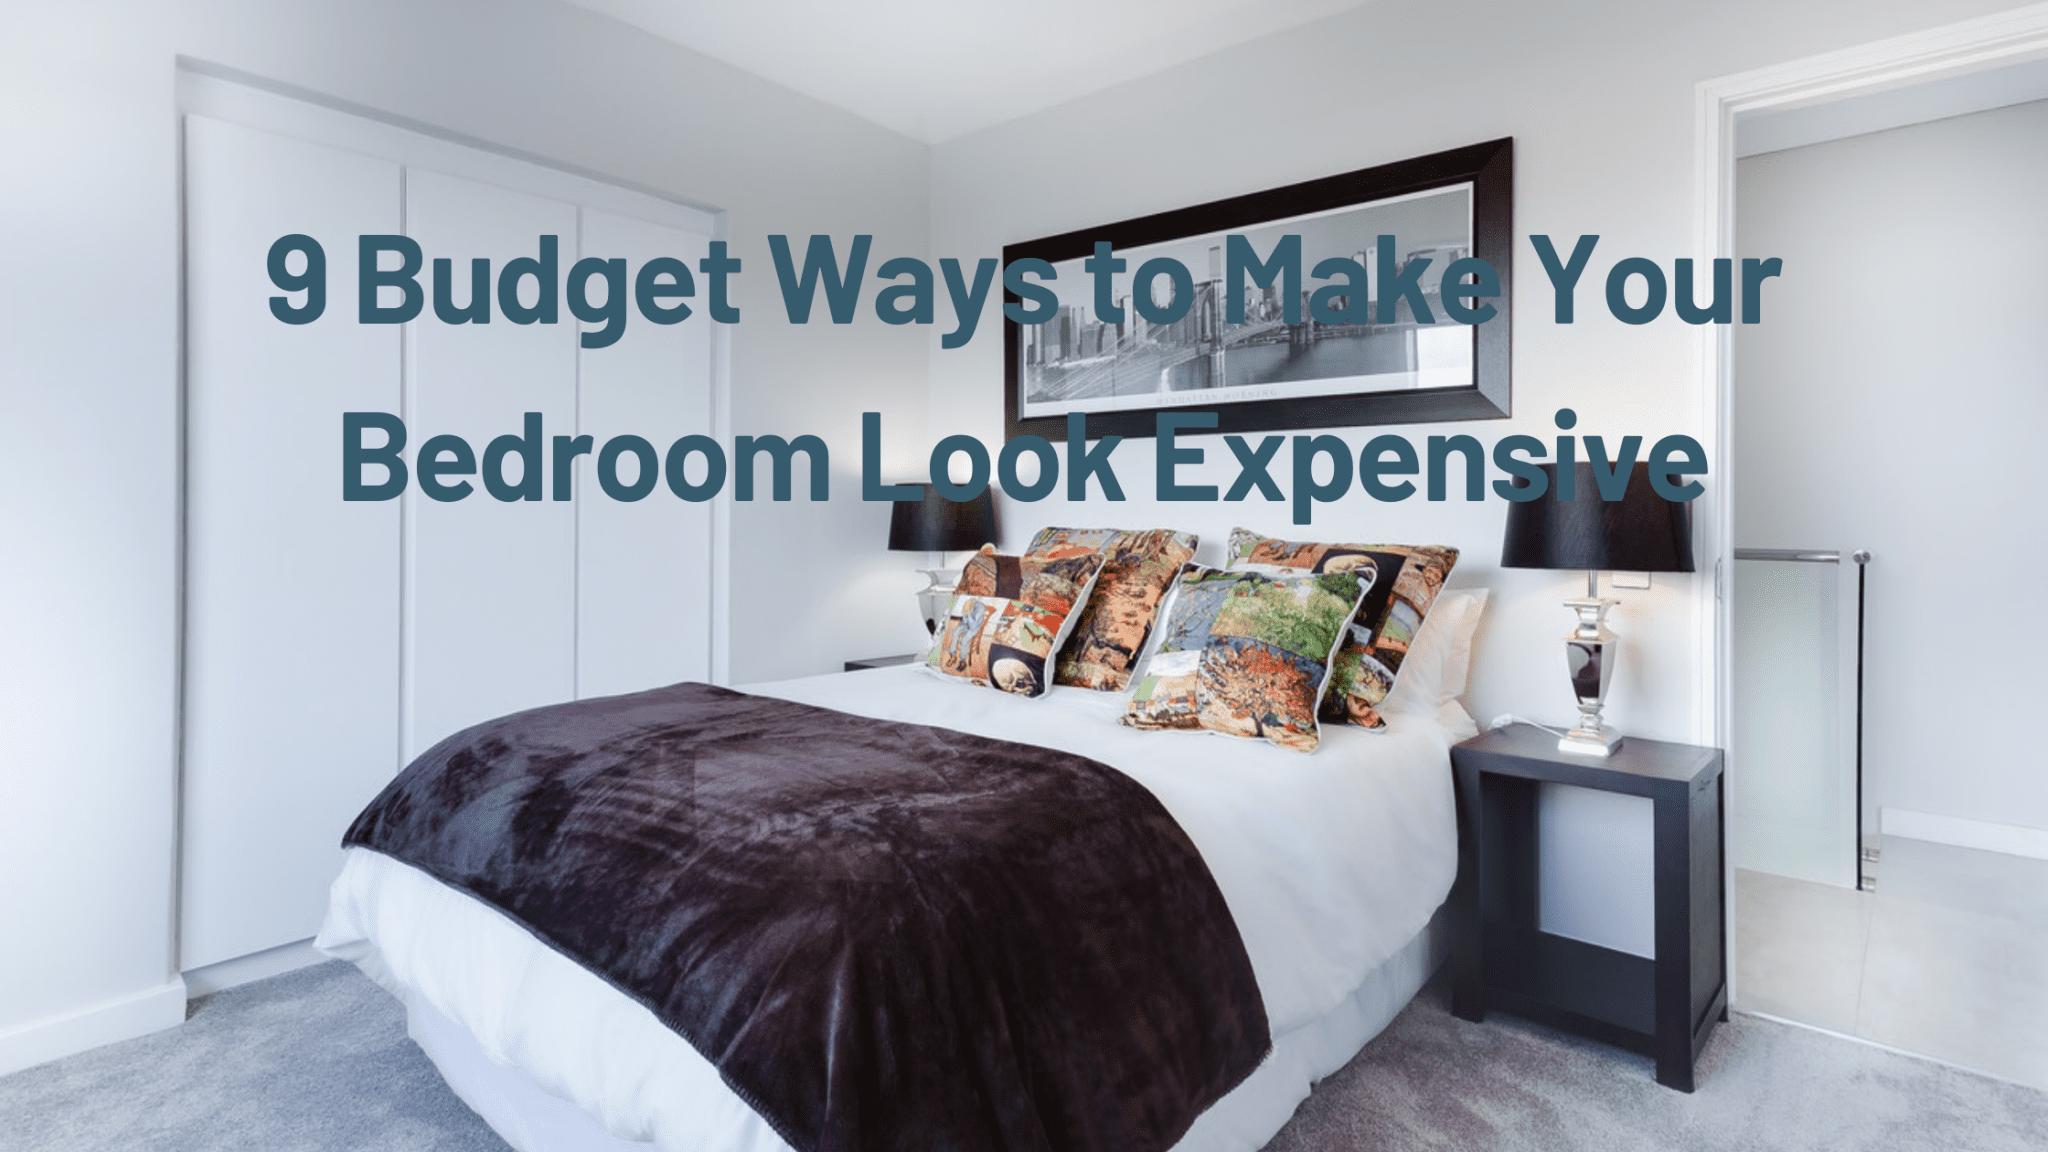 9 Budget Ways to Make Your Bedroom Look Expensive